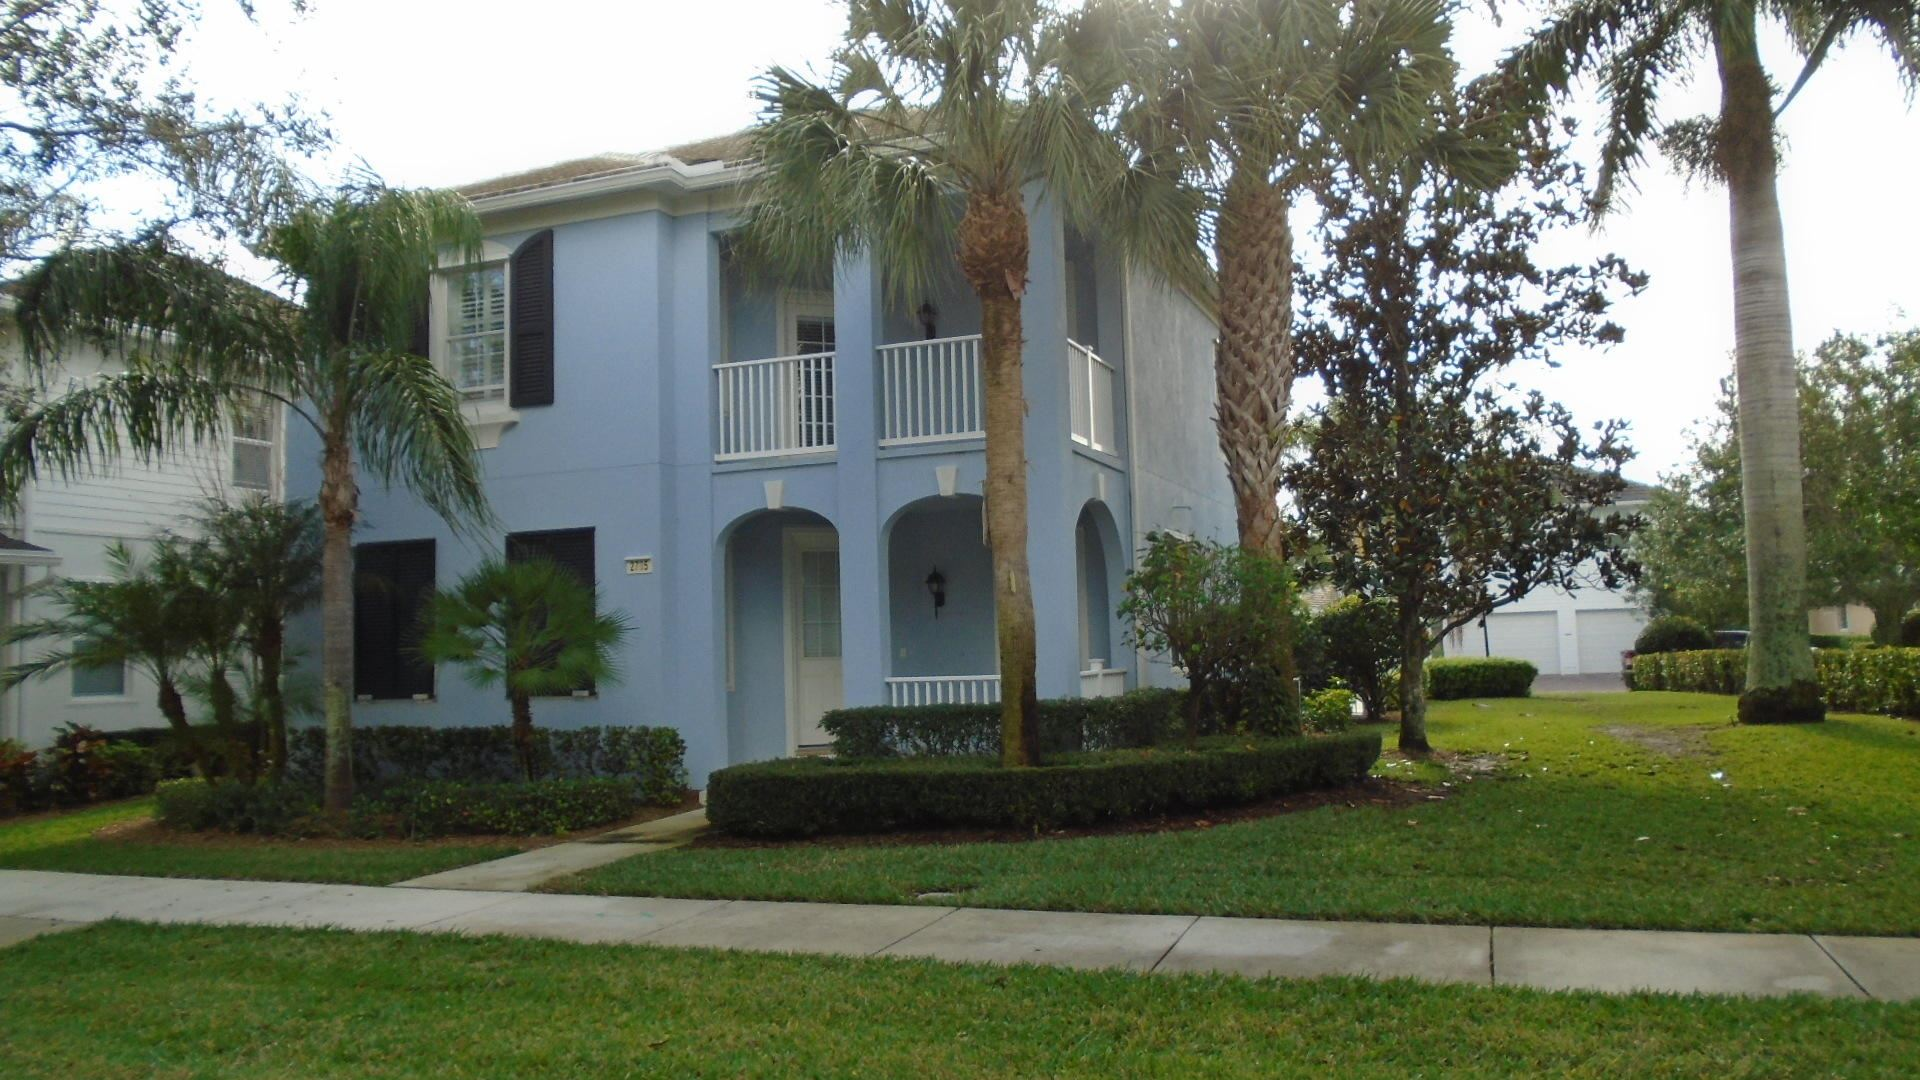 Photo of 2705 E Community Drive, Jupiter, FL 33458 (MLS # RX-10716224)